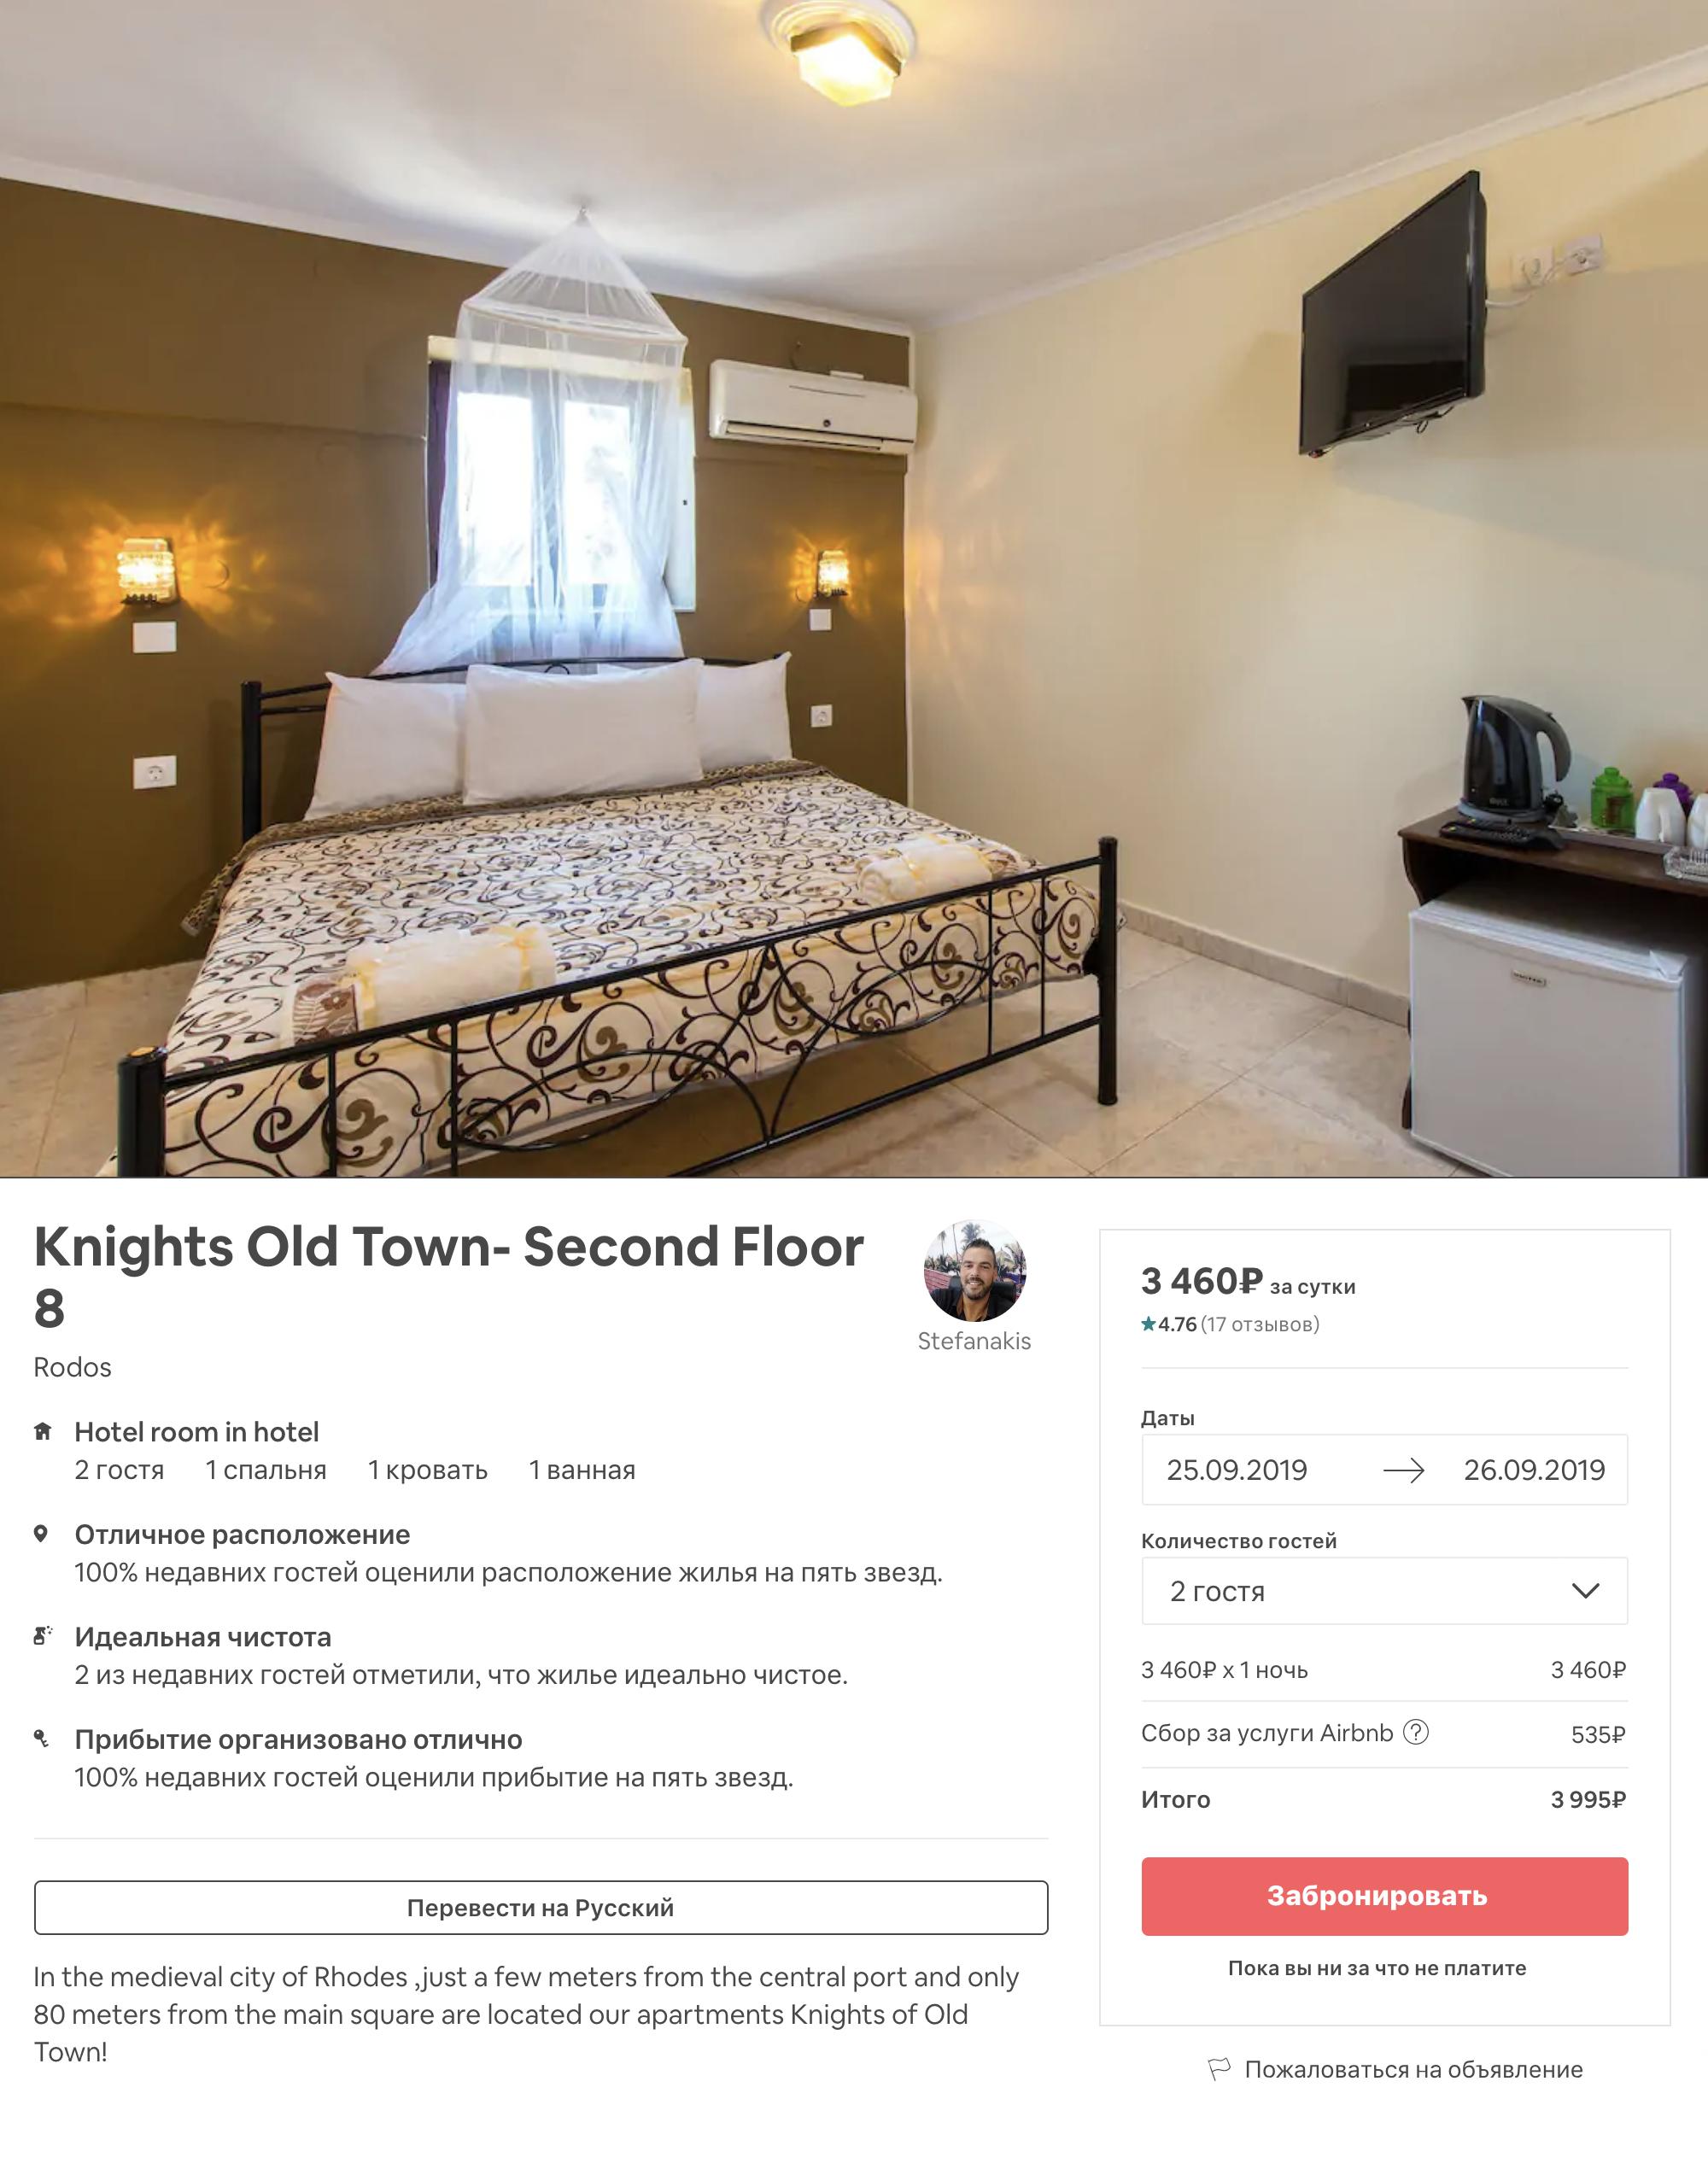 3640<span class=ruble>Р</span> за сутки — стандартная цена за номер в гостинице в центре города Родос в сентябре 2019 года. Но это цена без комиссии Airbnb